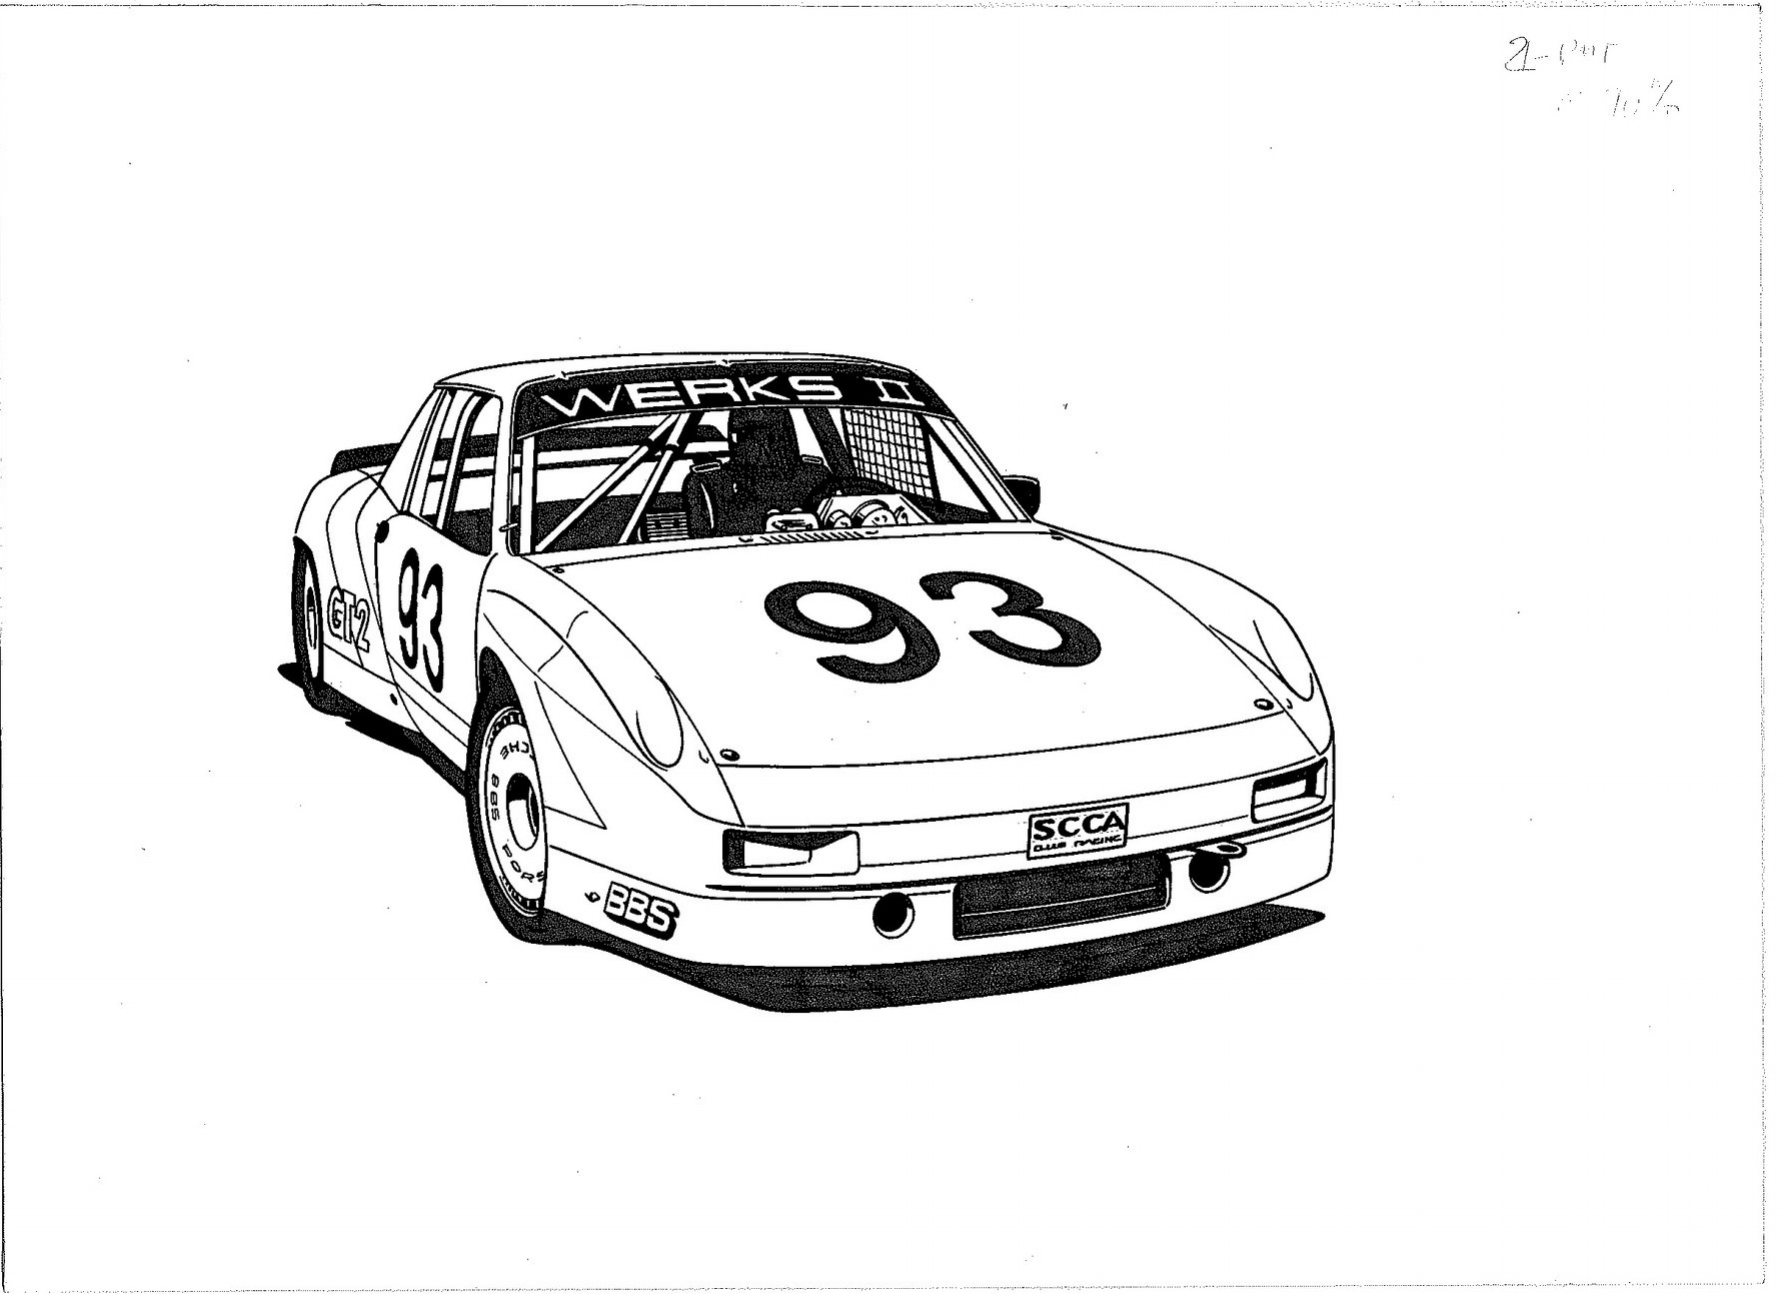 Sketch-21.jpeg